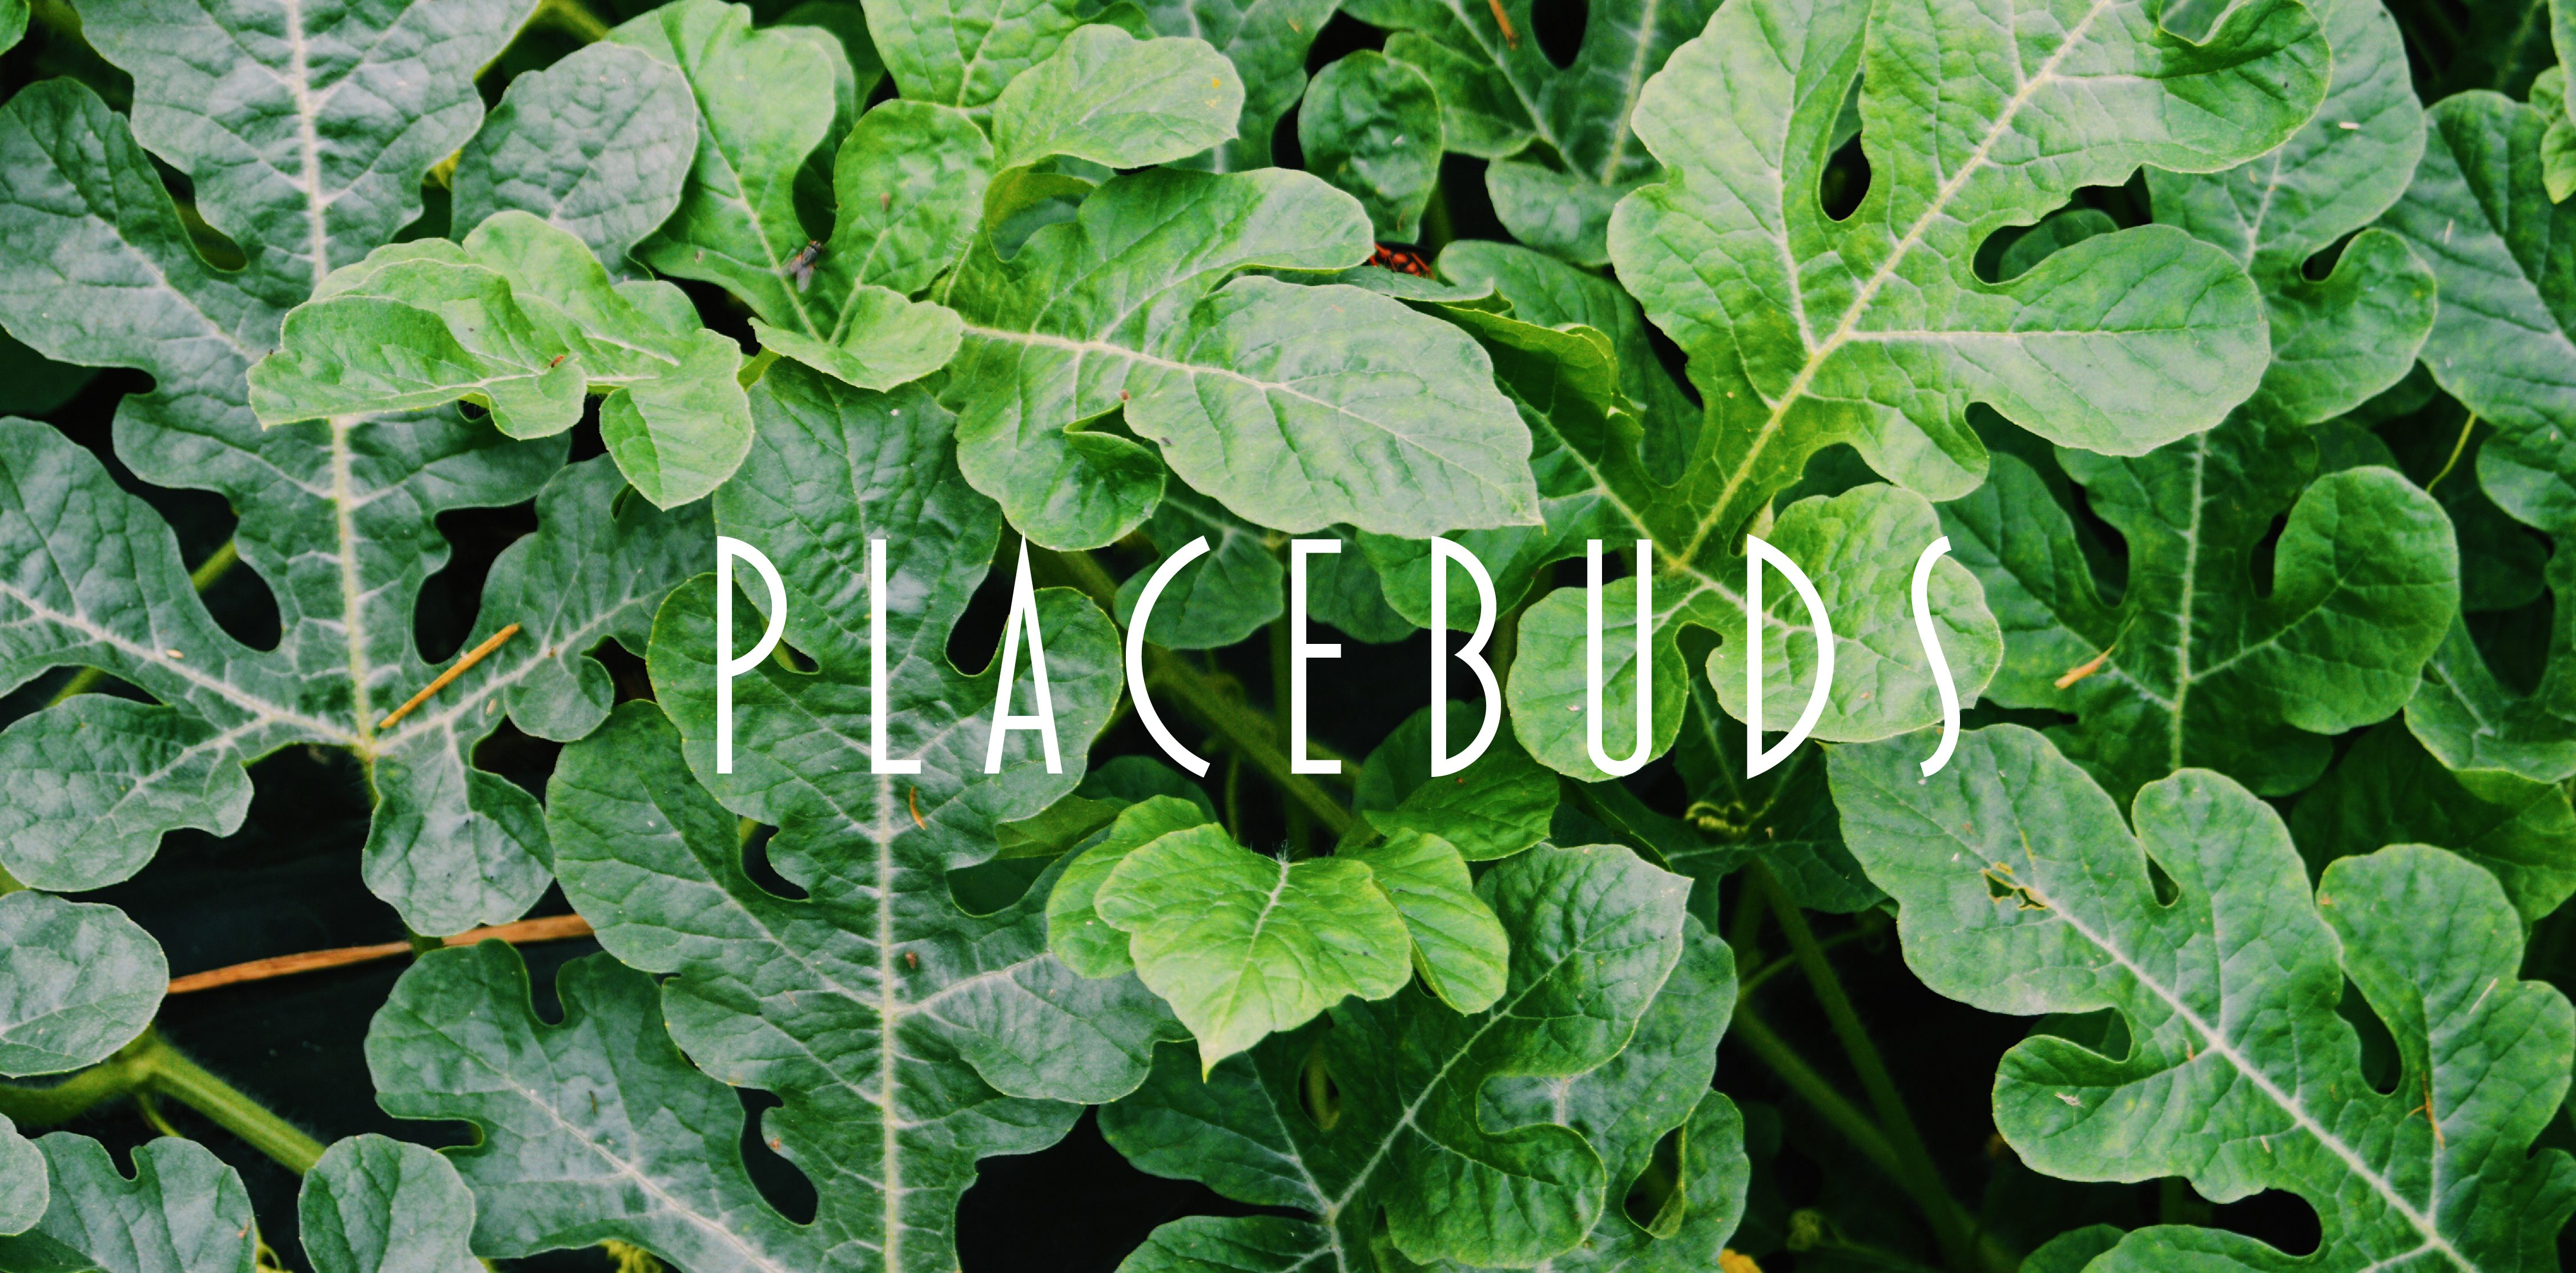 Placebuds